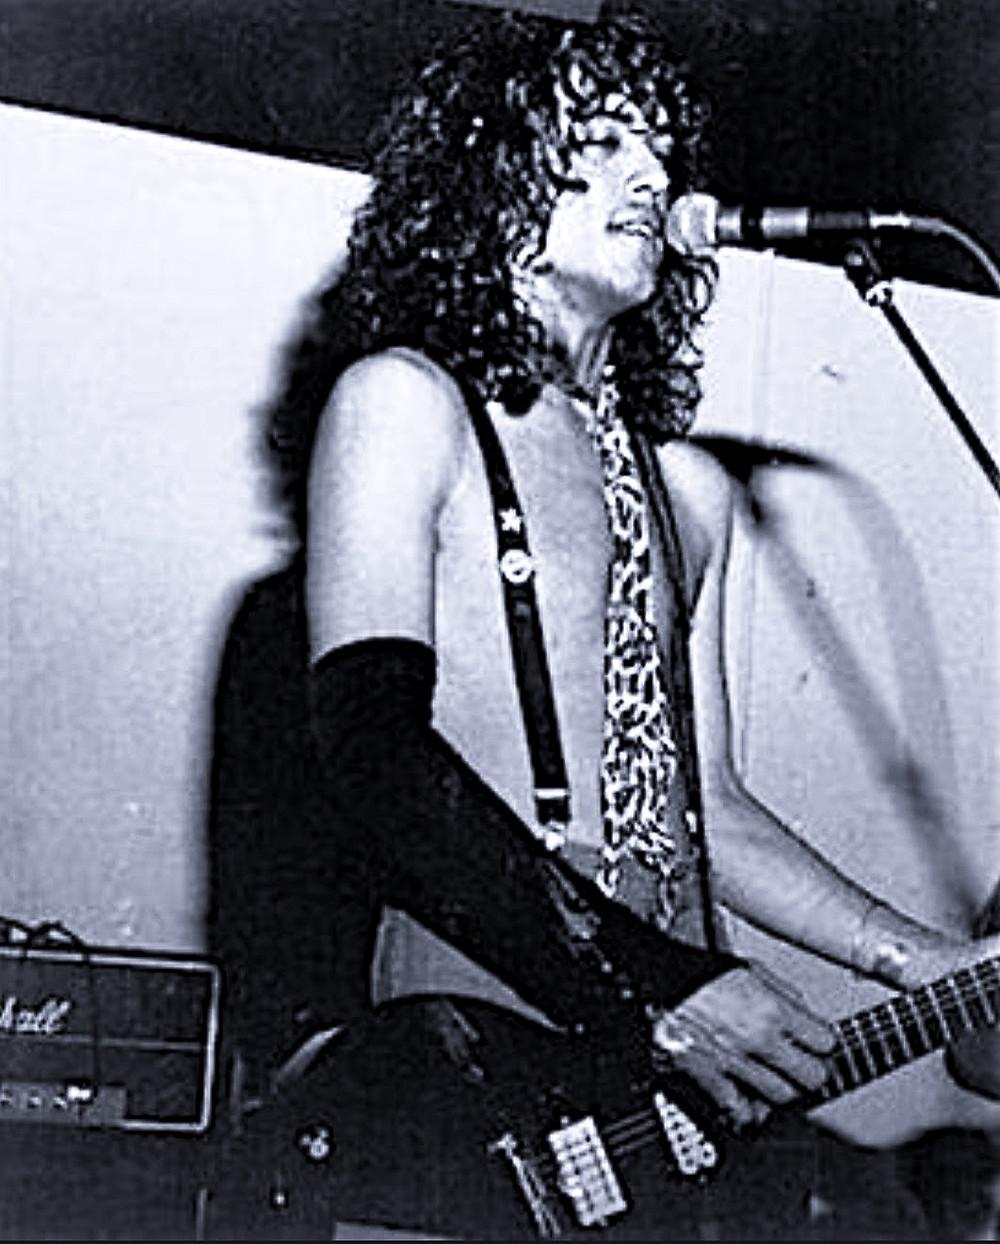 STEPHEN PEARCY in Mickey RATT, circa 1978 San Diego